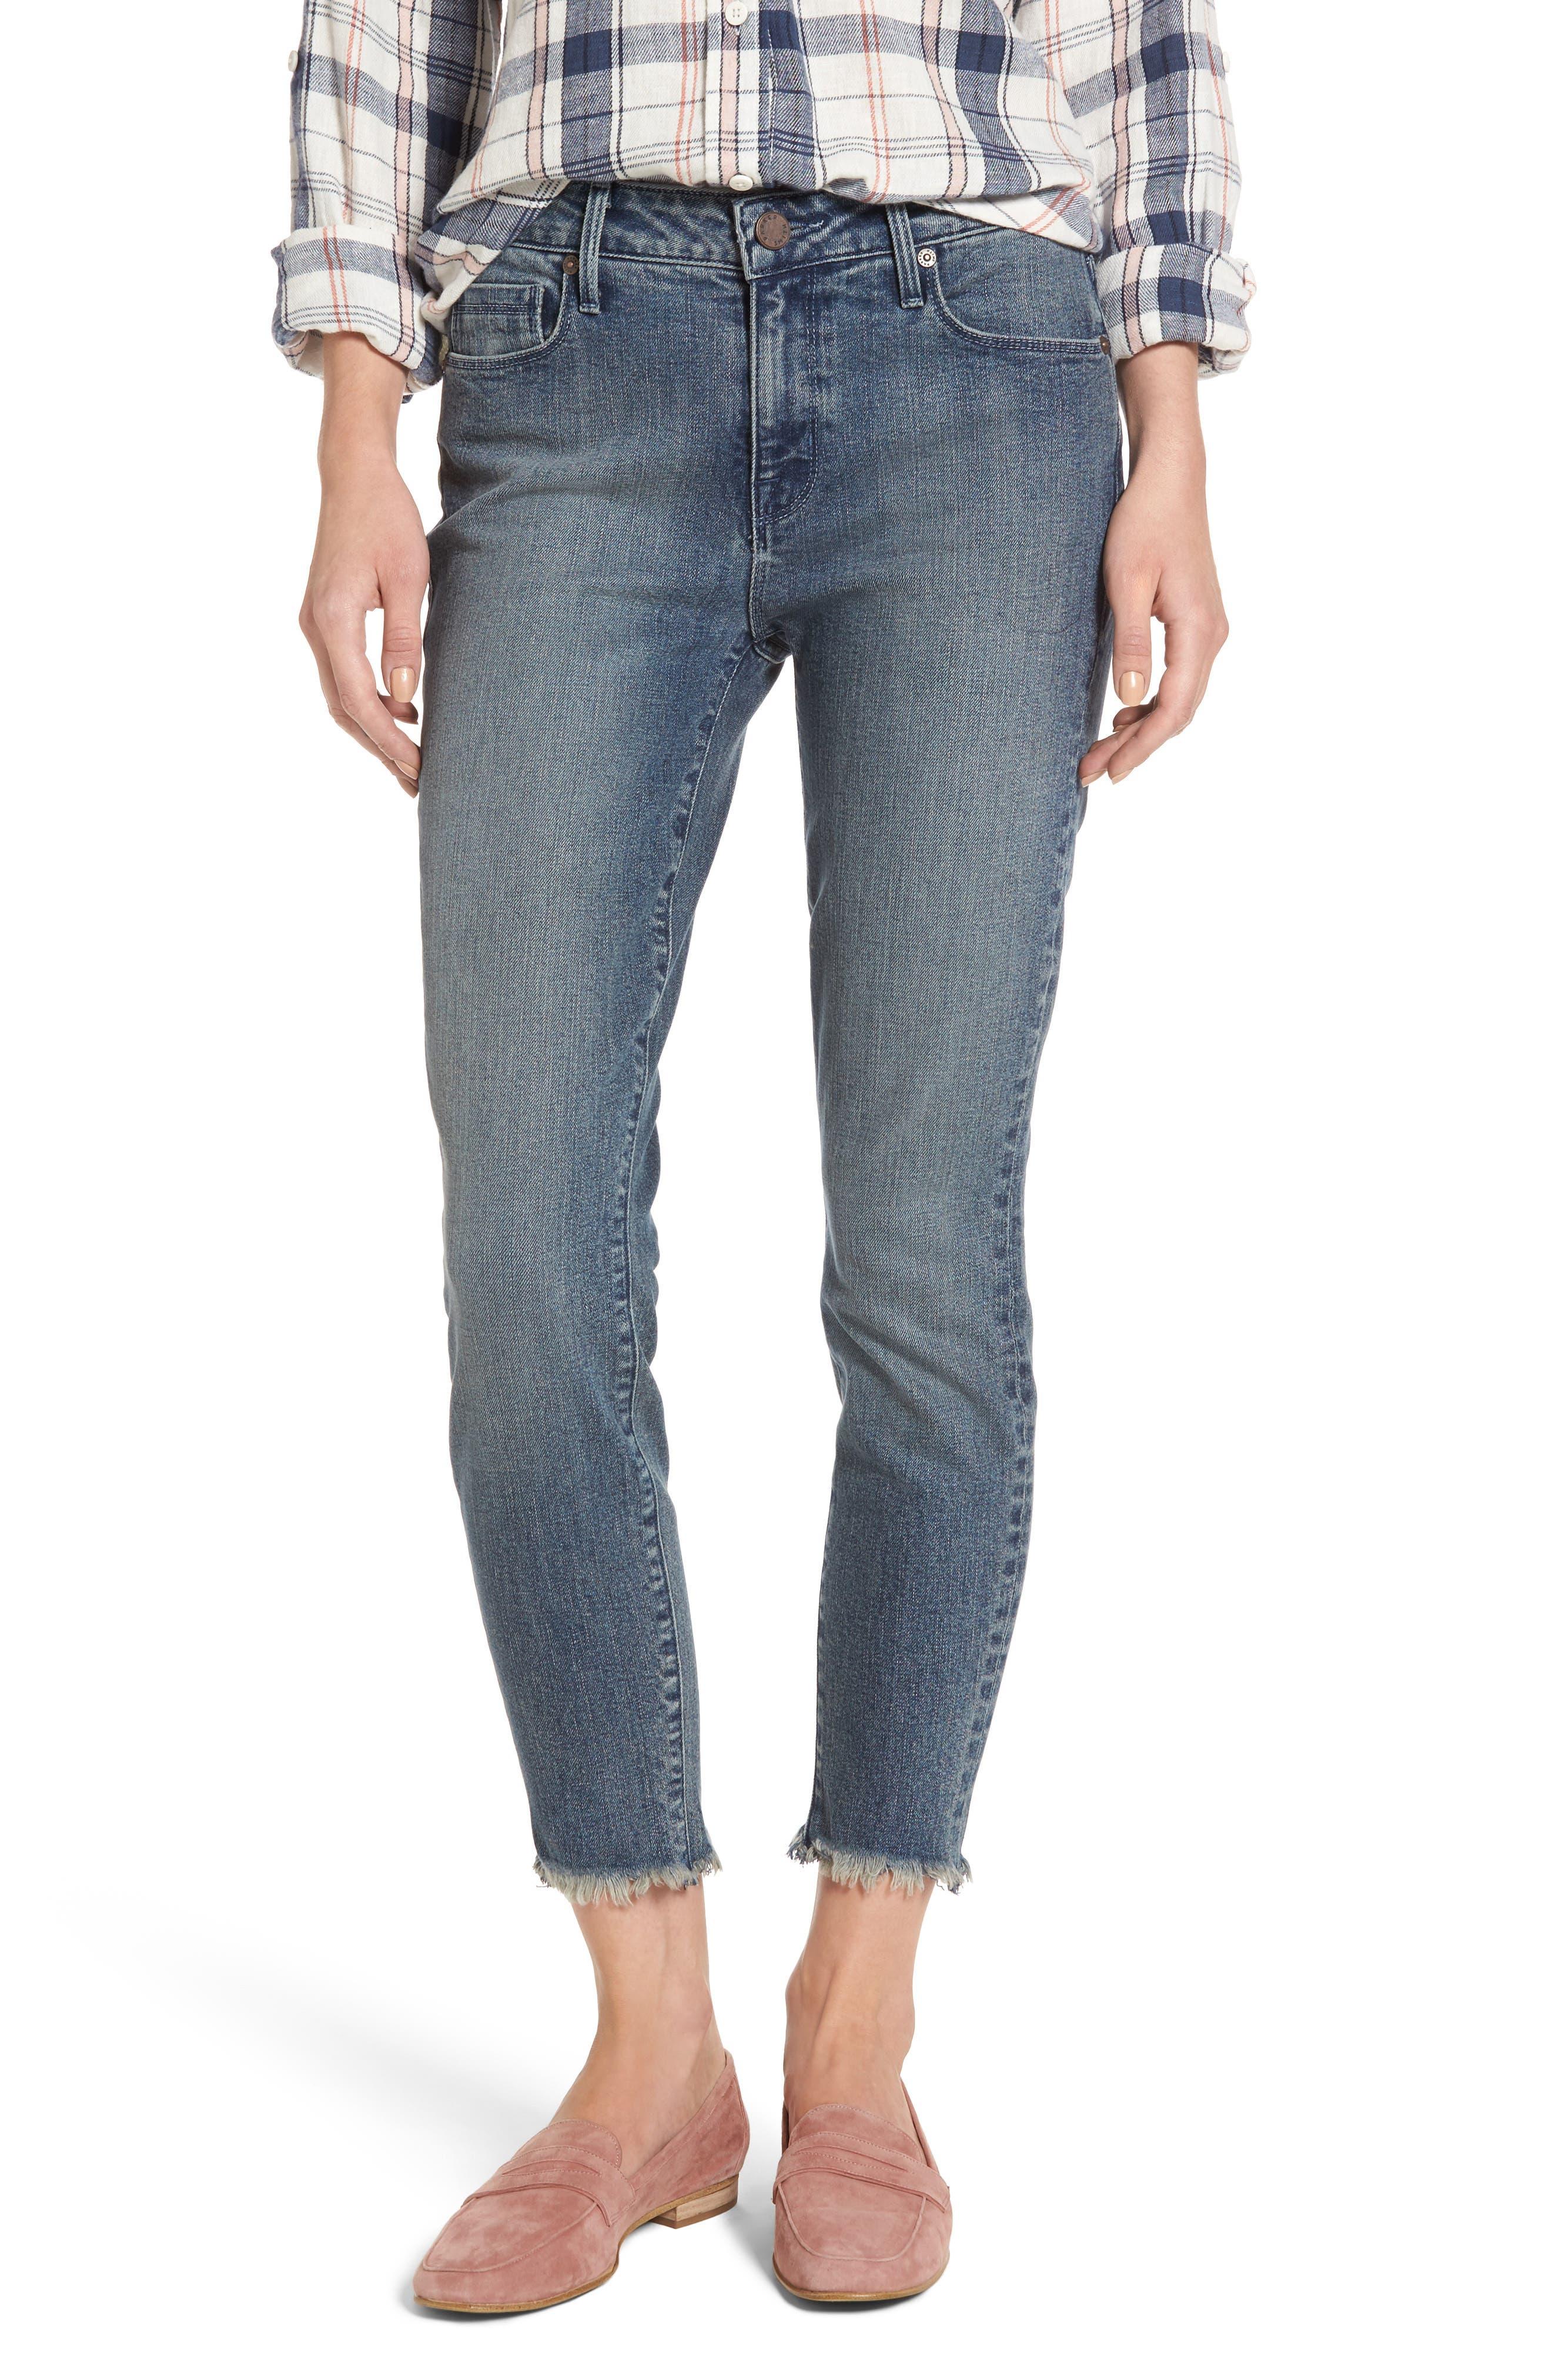 PARKER SMITH Ava Crop Skinny Jeans (Madeline)